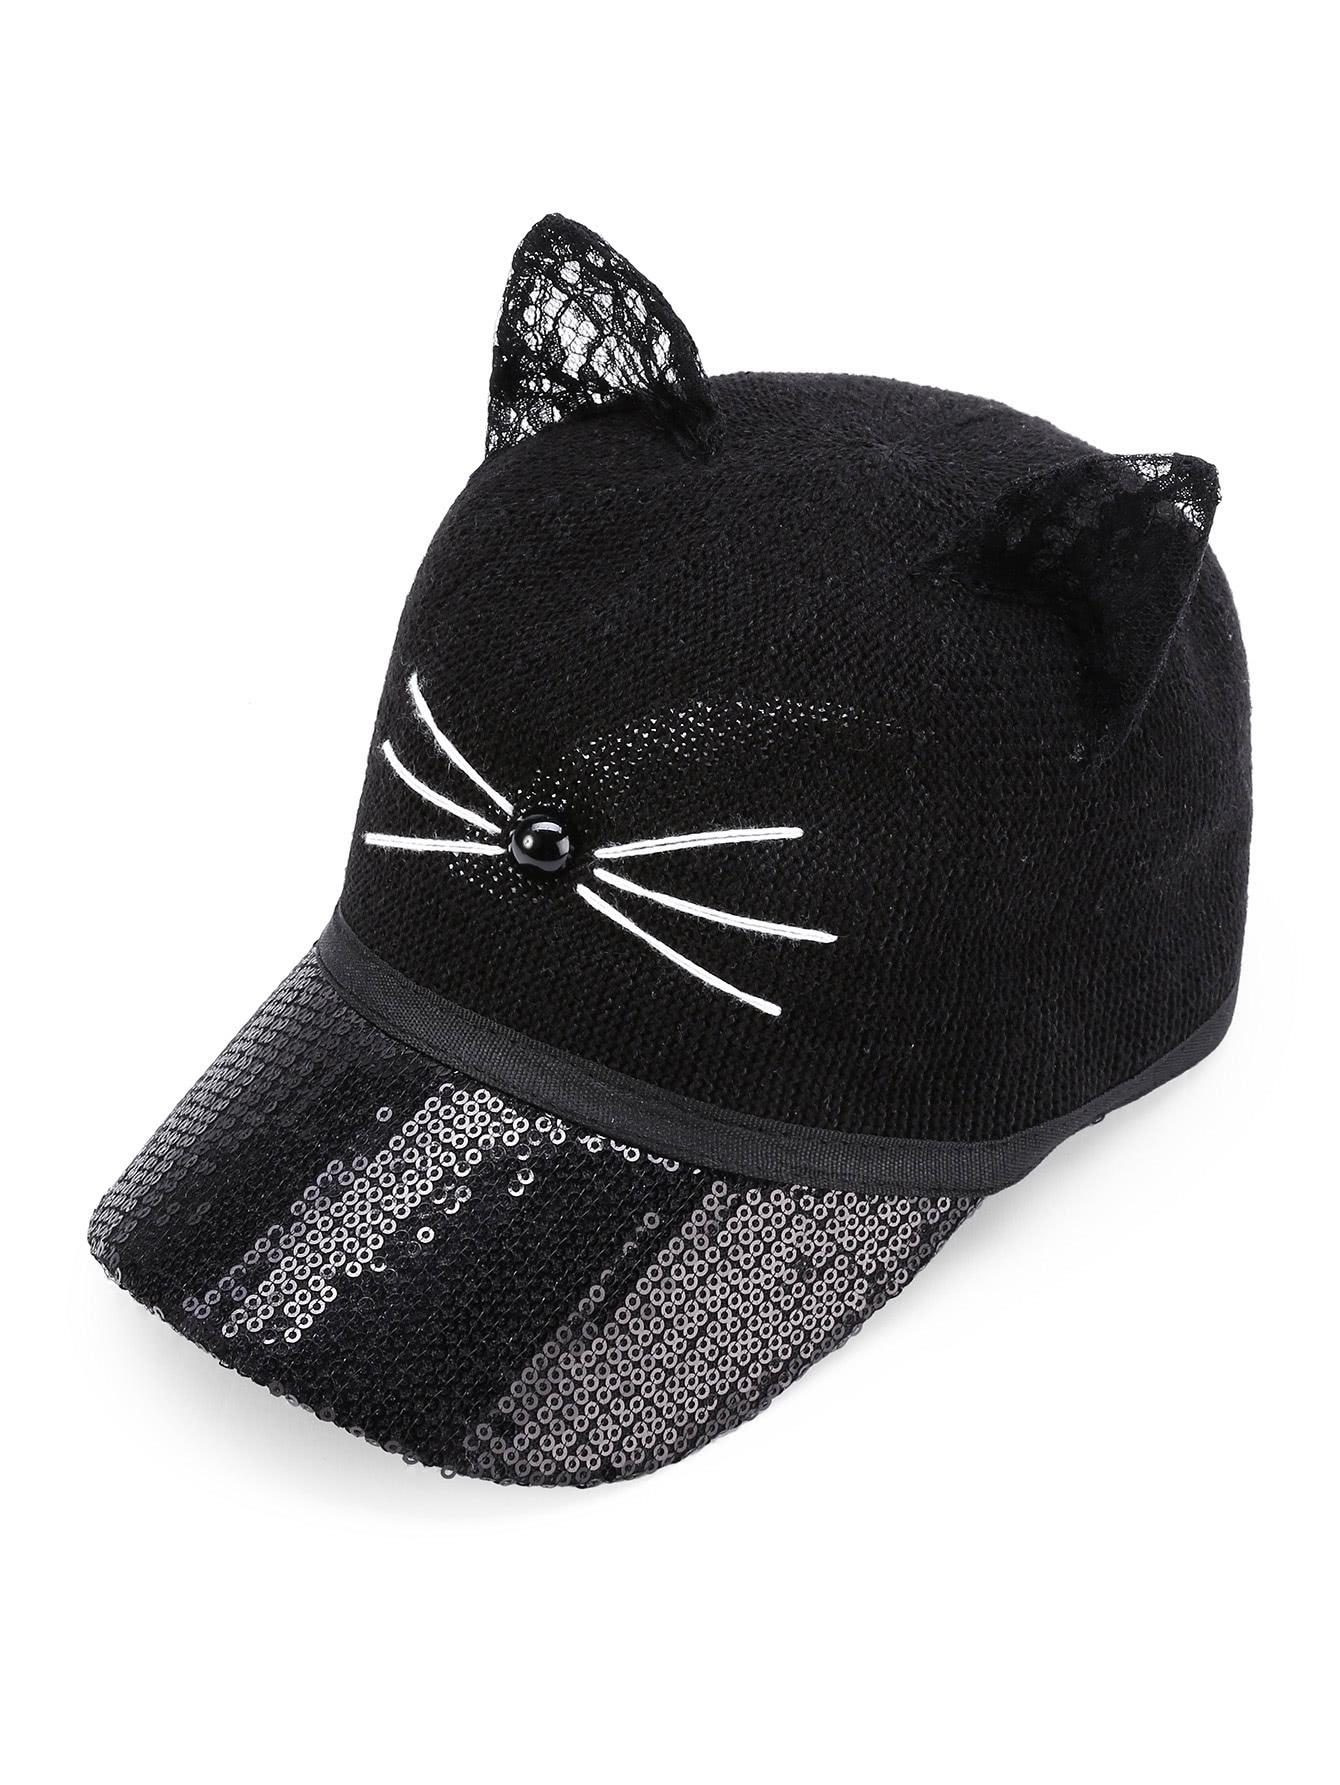 Gorro con estilo de béisbol con oreja de gato con lentejuelas -Spanish  SheIn(Sheinside) 6c4df72ef22